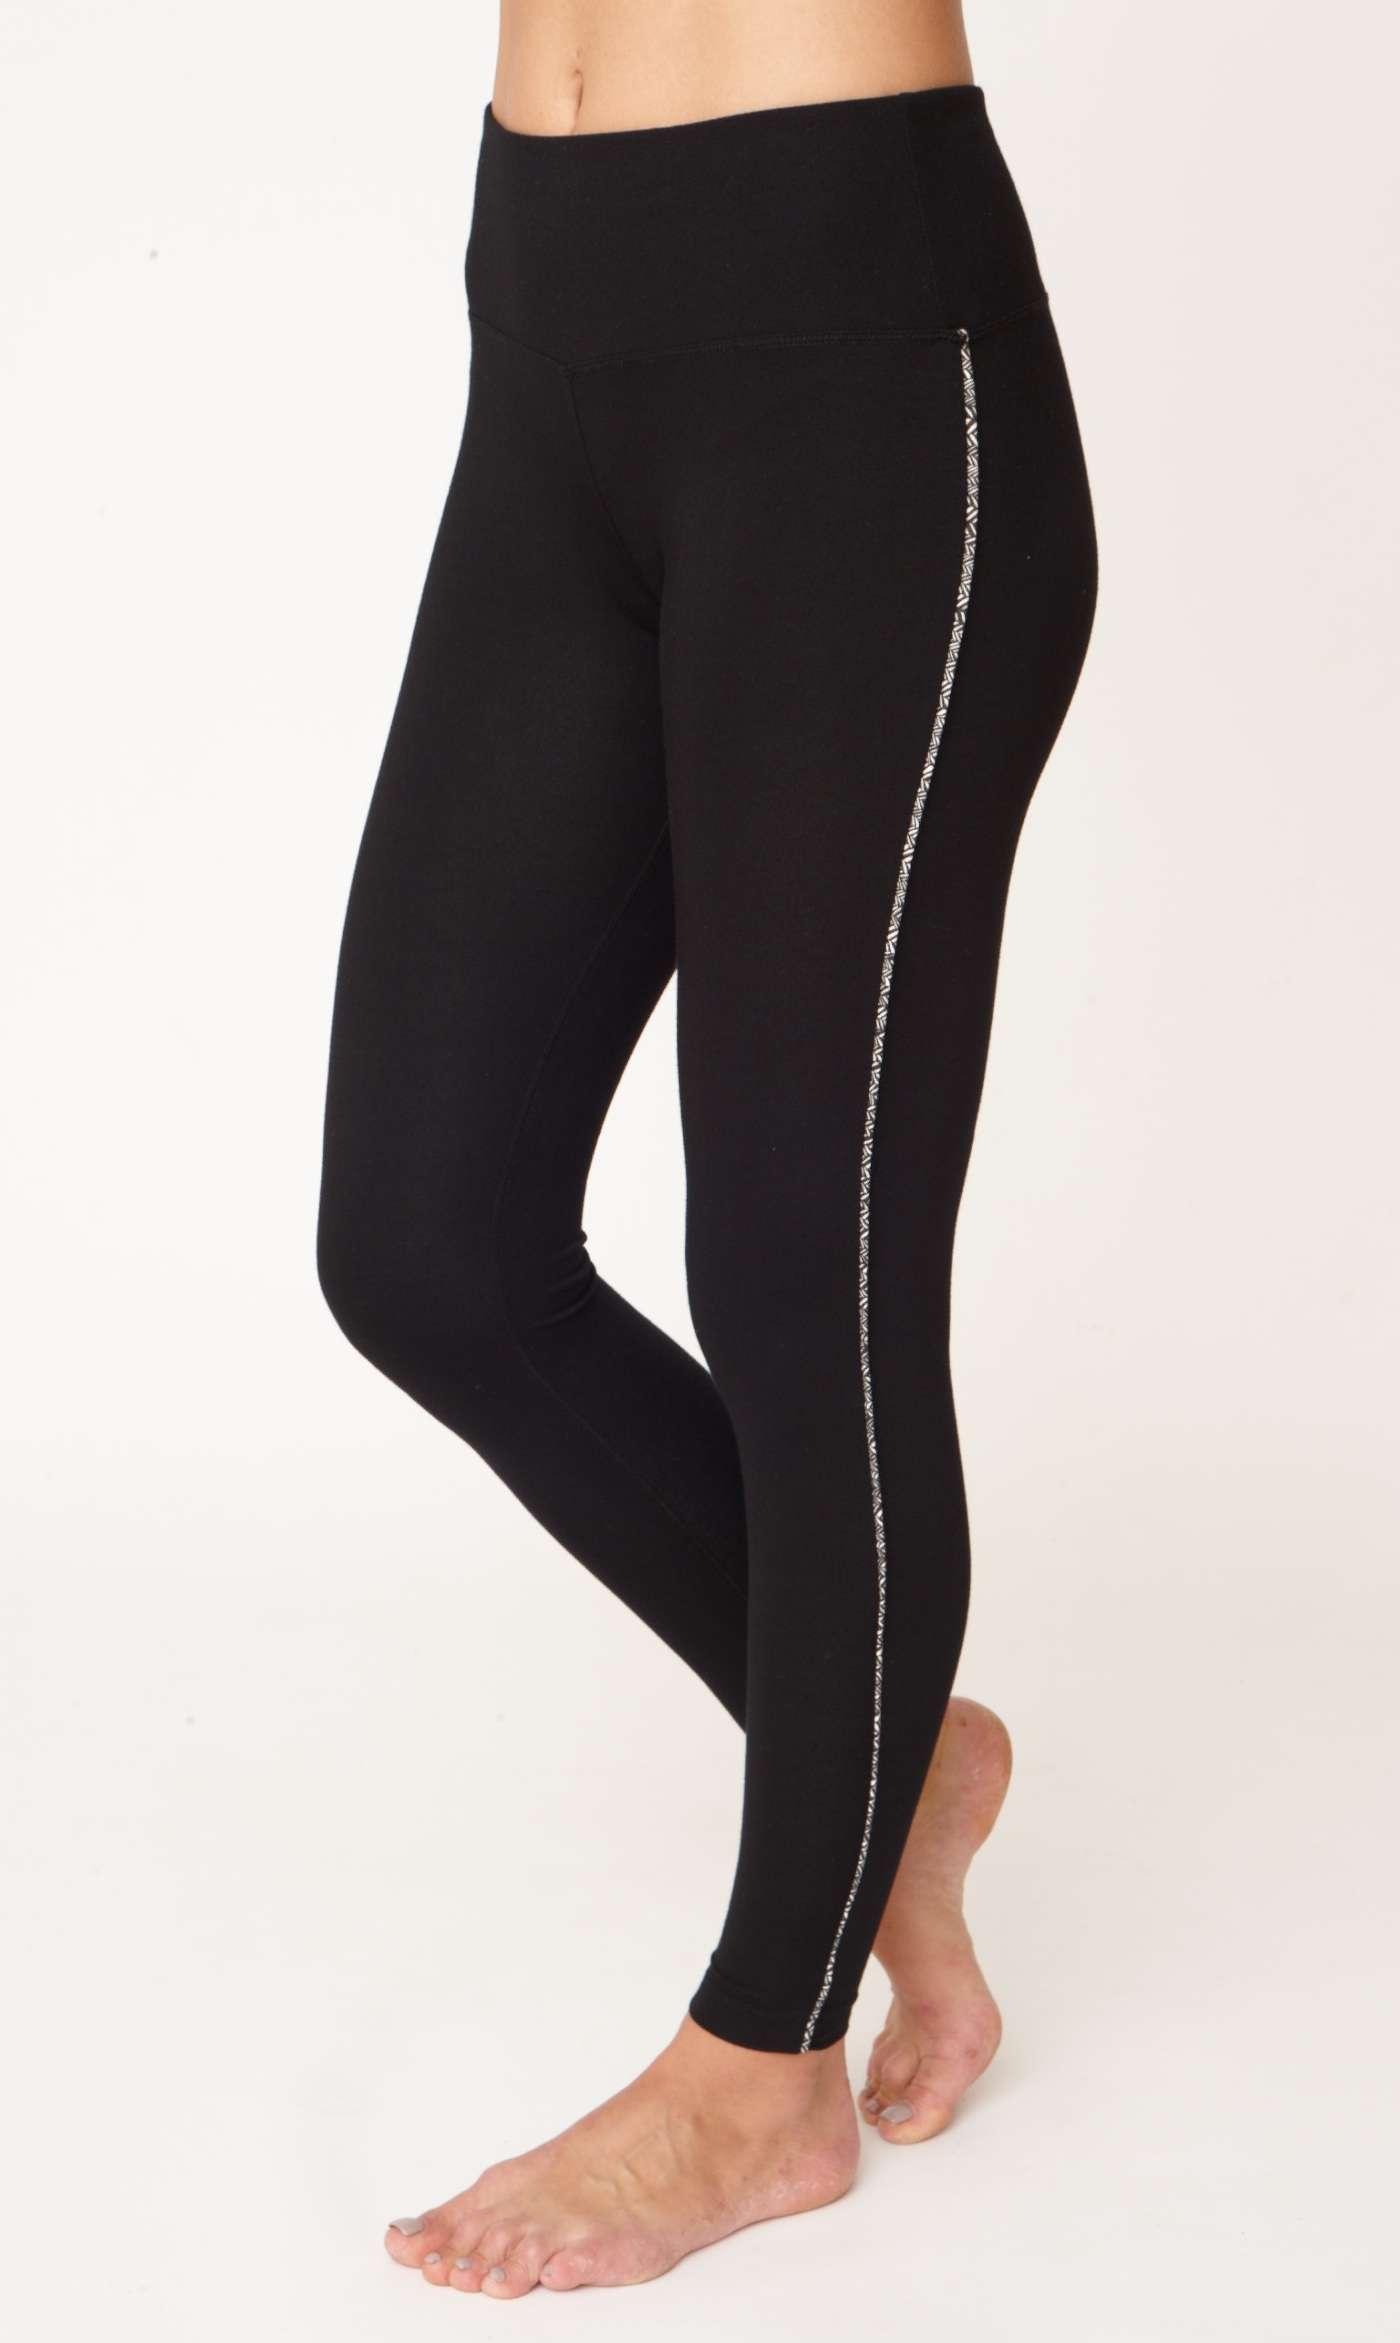 Asquith Flow With It Full Length Yoga Leggings Jet Black with Herringbone Stripe